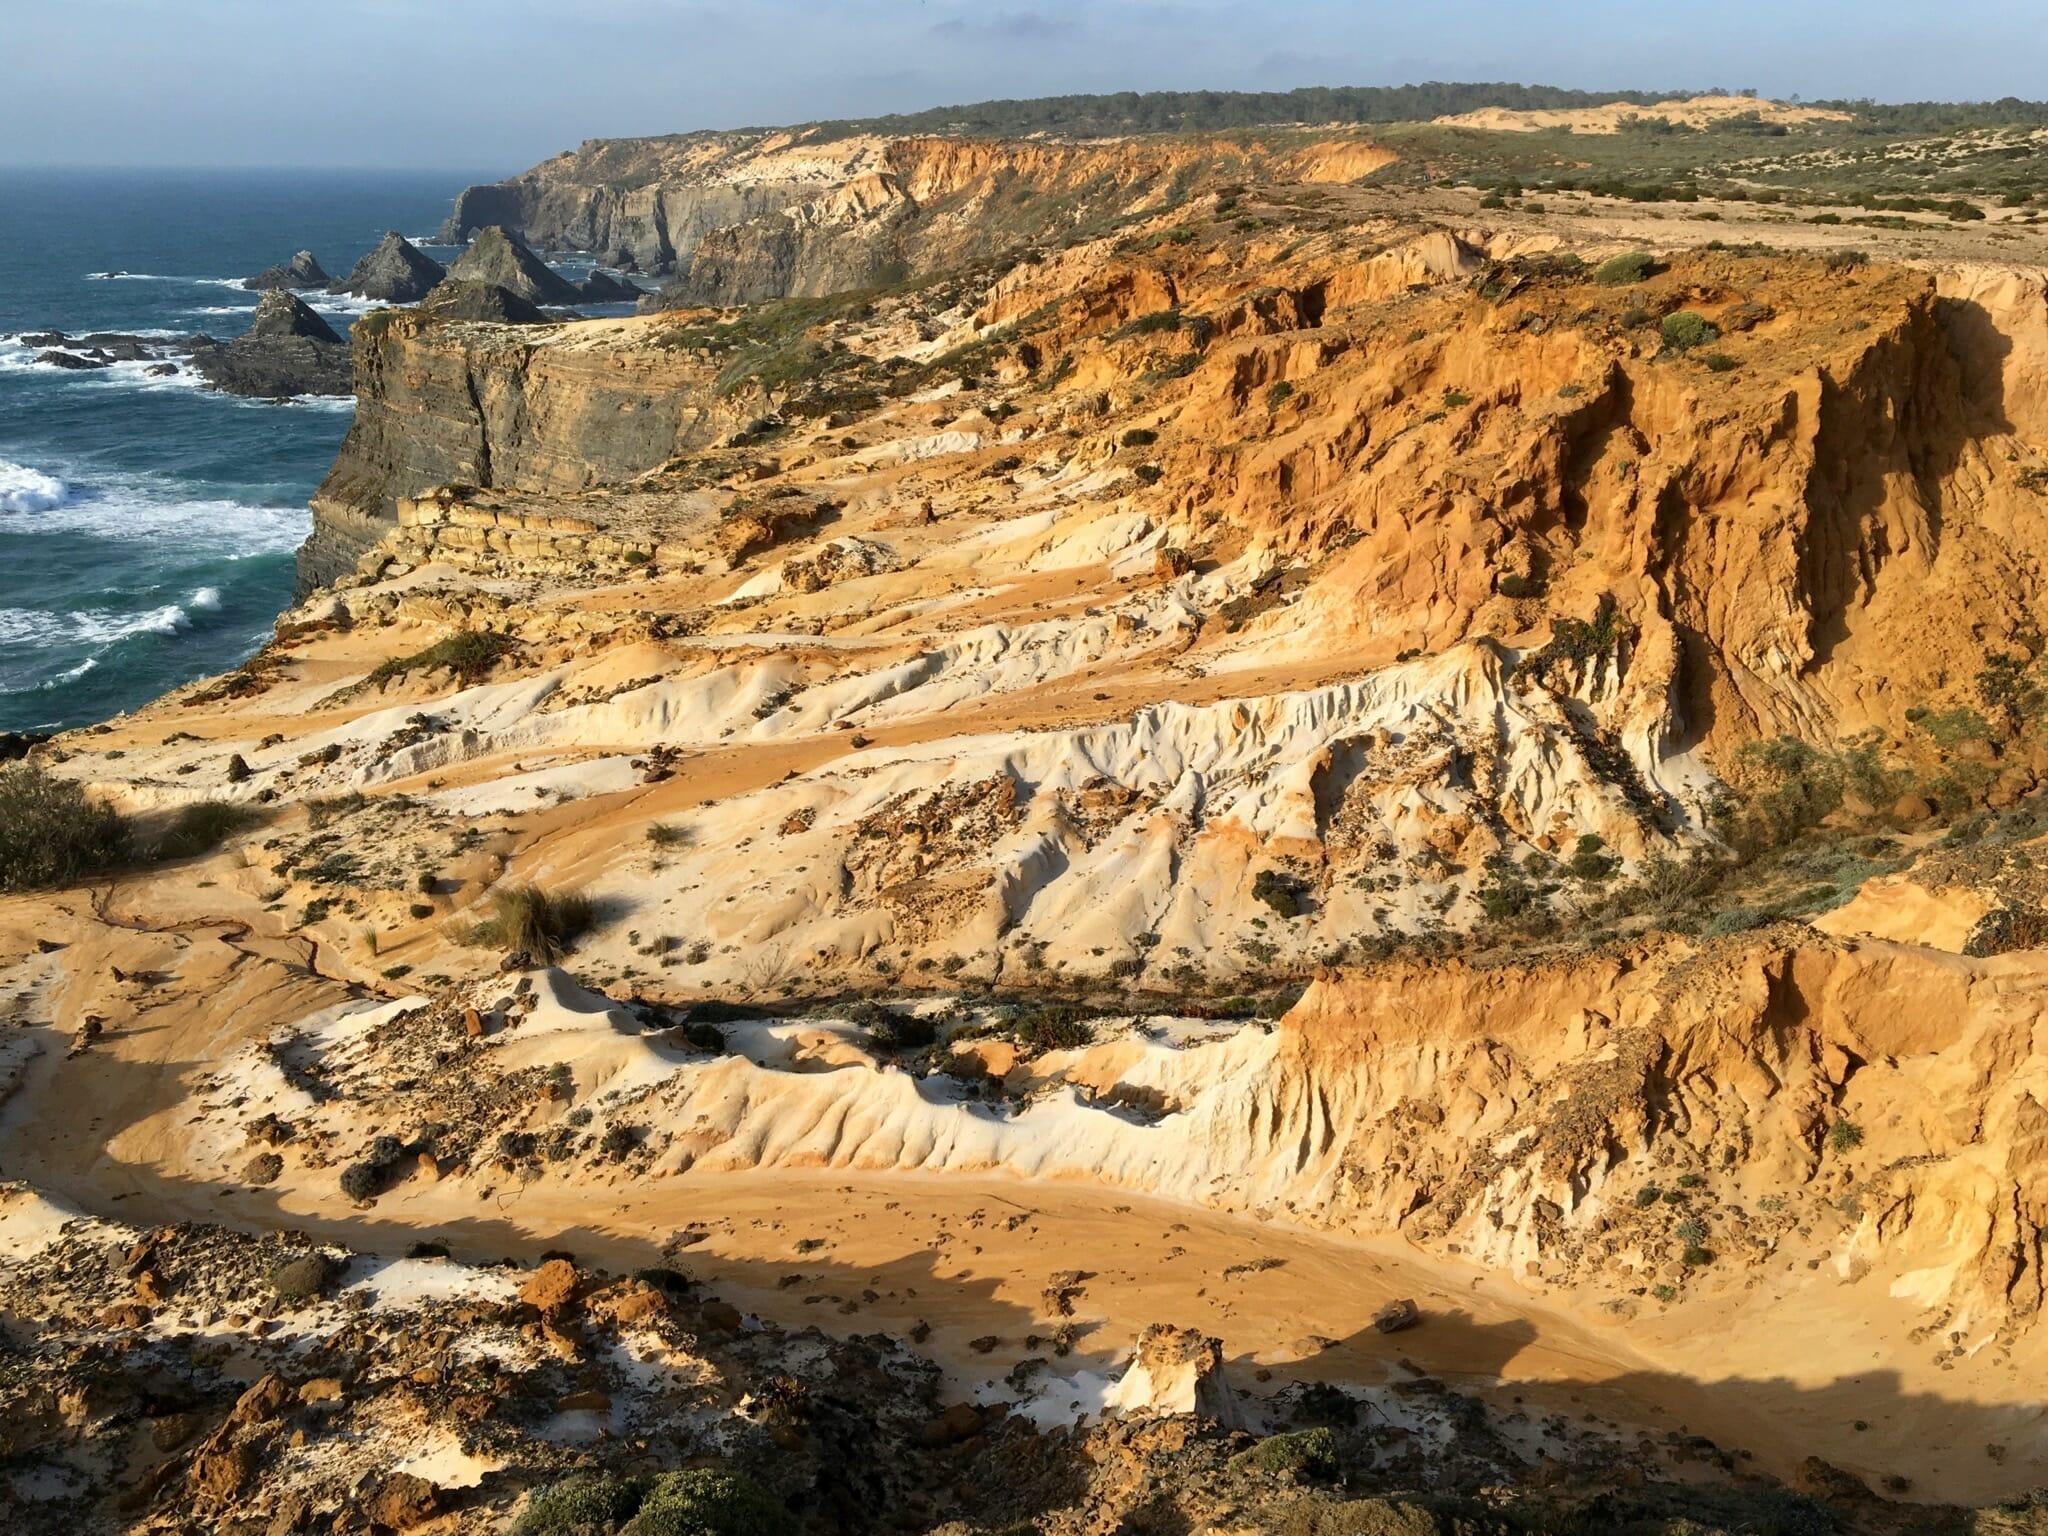 Eroding coastline near Praia da Laginha (Knights Beach)